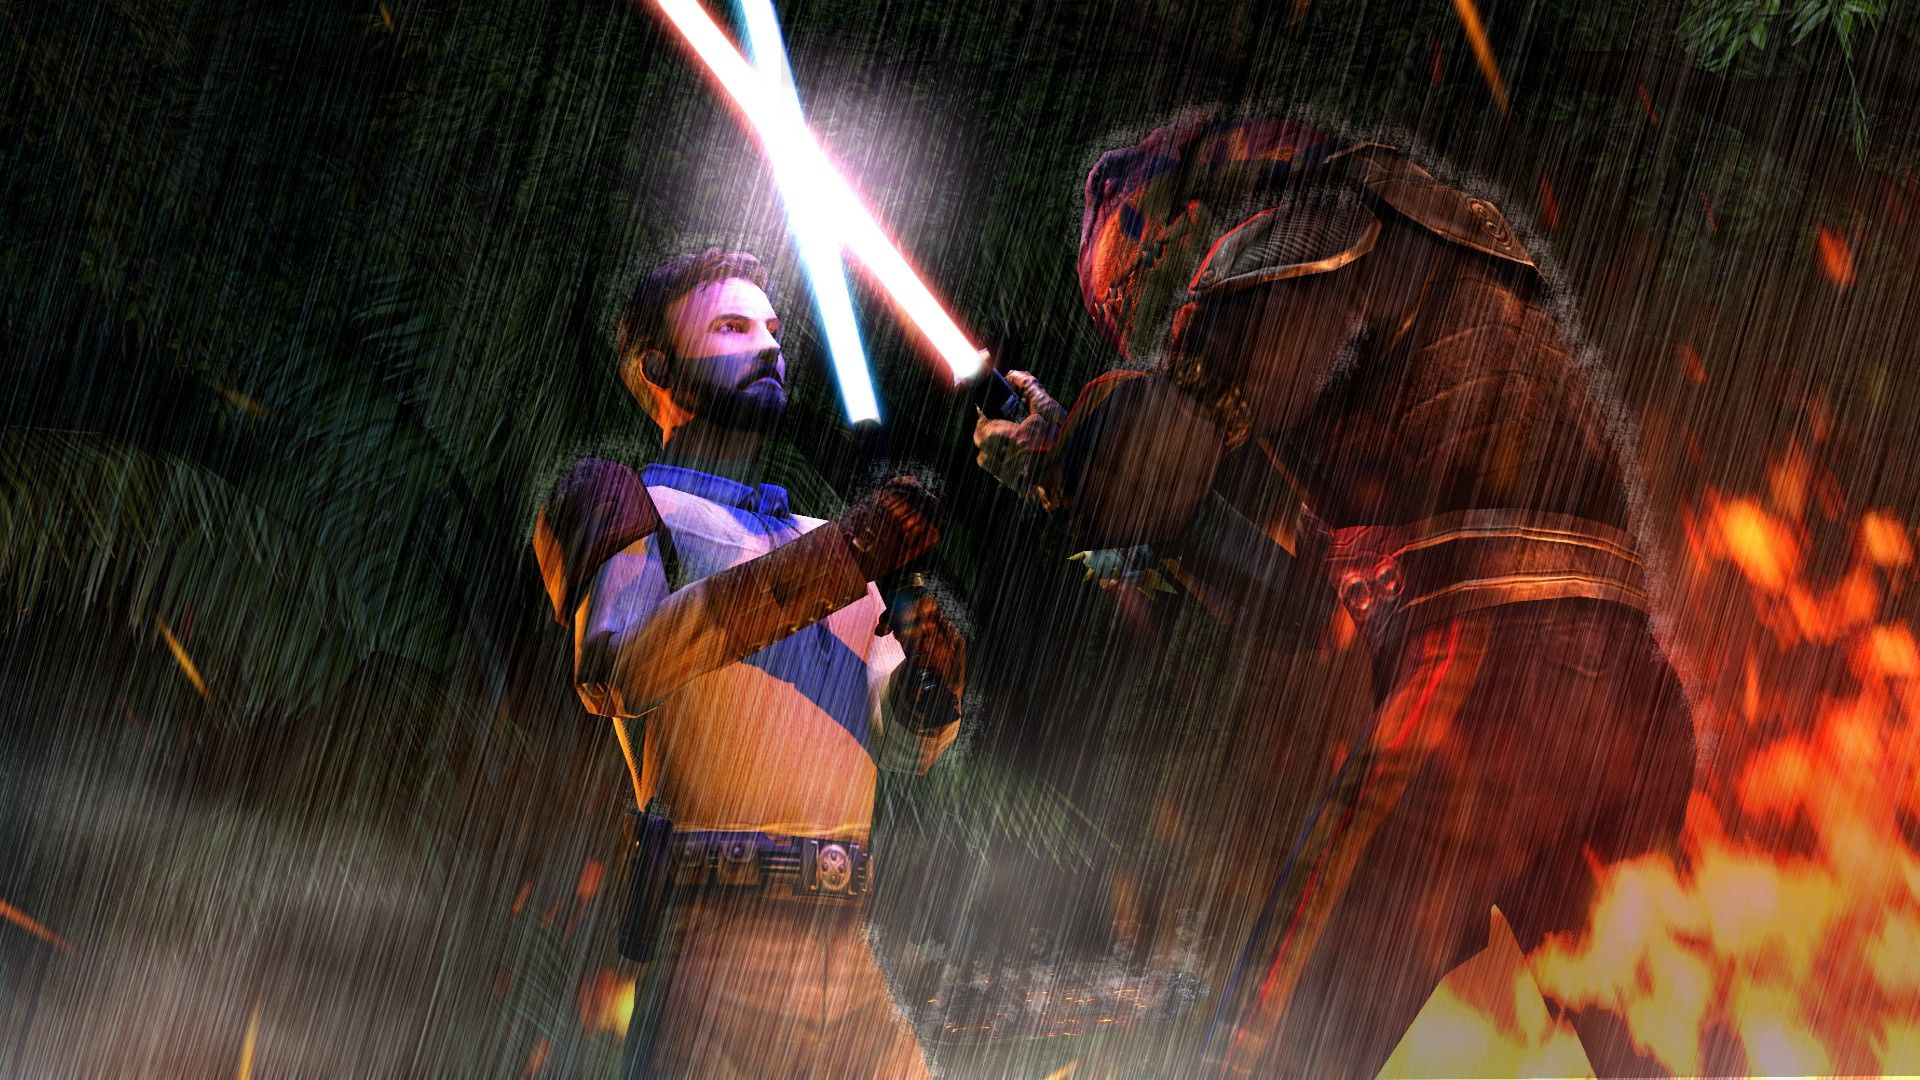 Kyle Katarn Vs Desaan Jedi Outcast Video Game Jedi Outcast Star Wars Facts Kyle Katarn